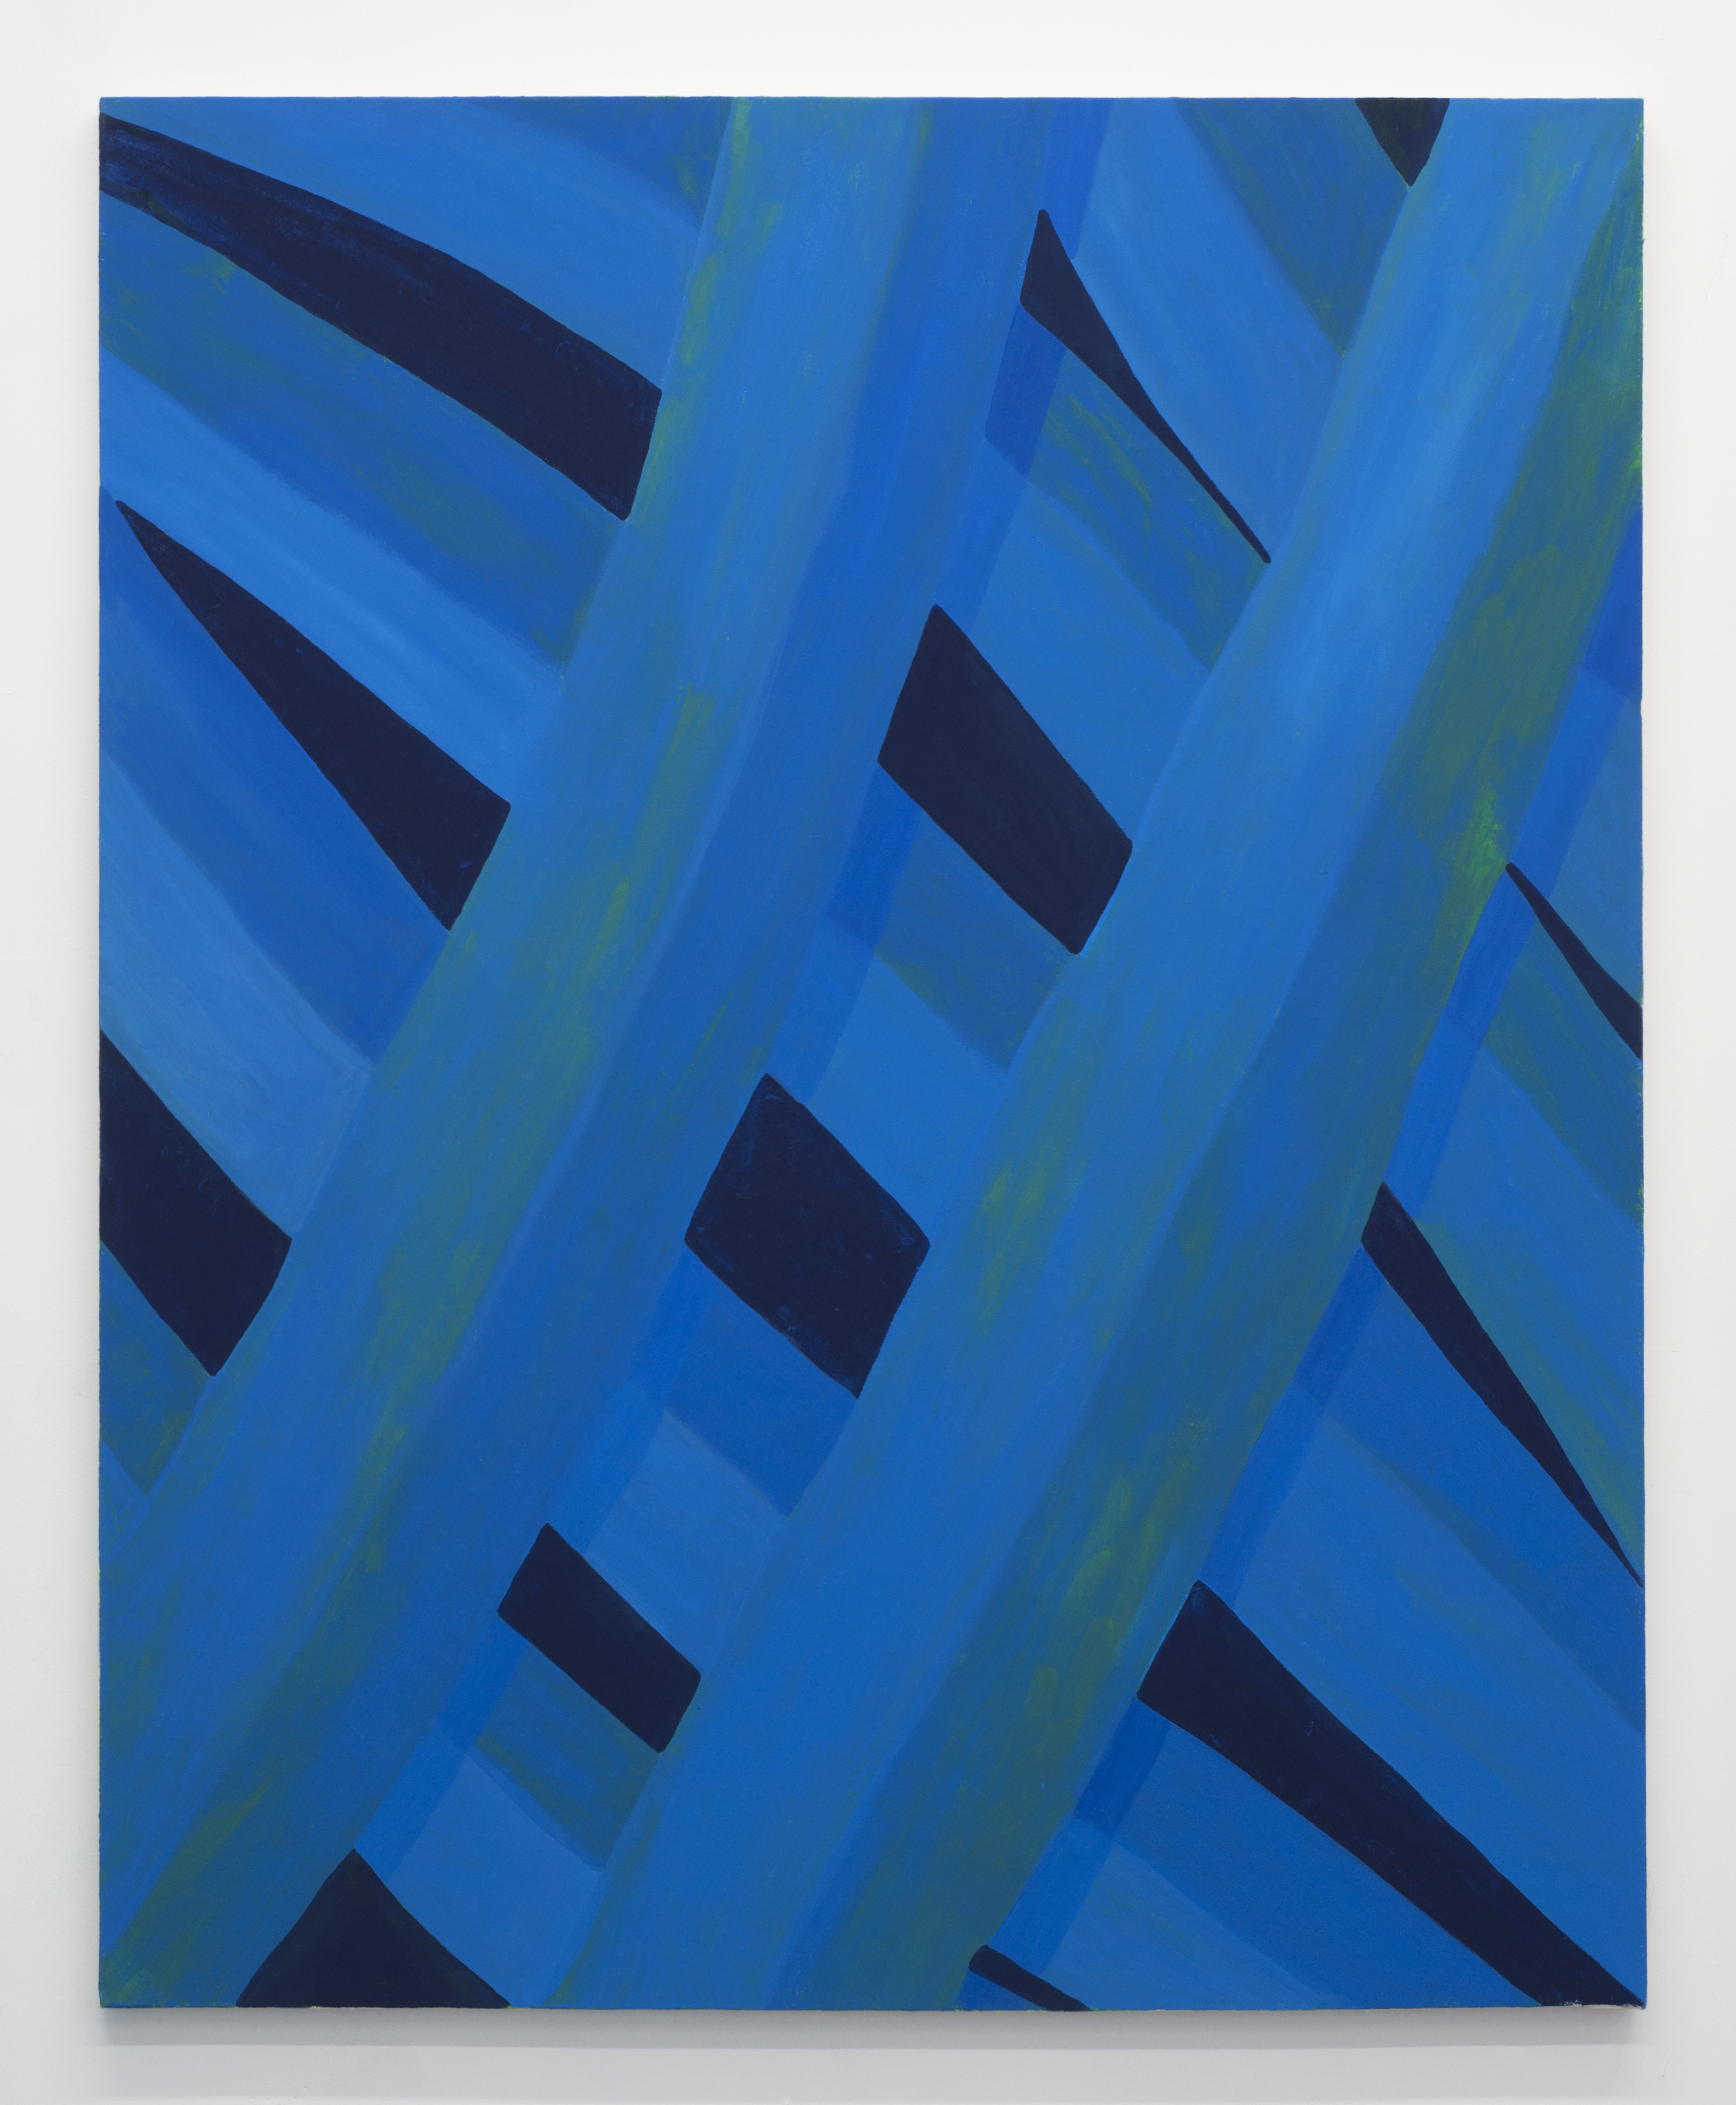 Corydon Cowansage, Grass 47, 2015, acrylic on canvas, 50 x 40 inches